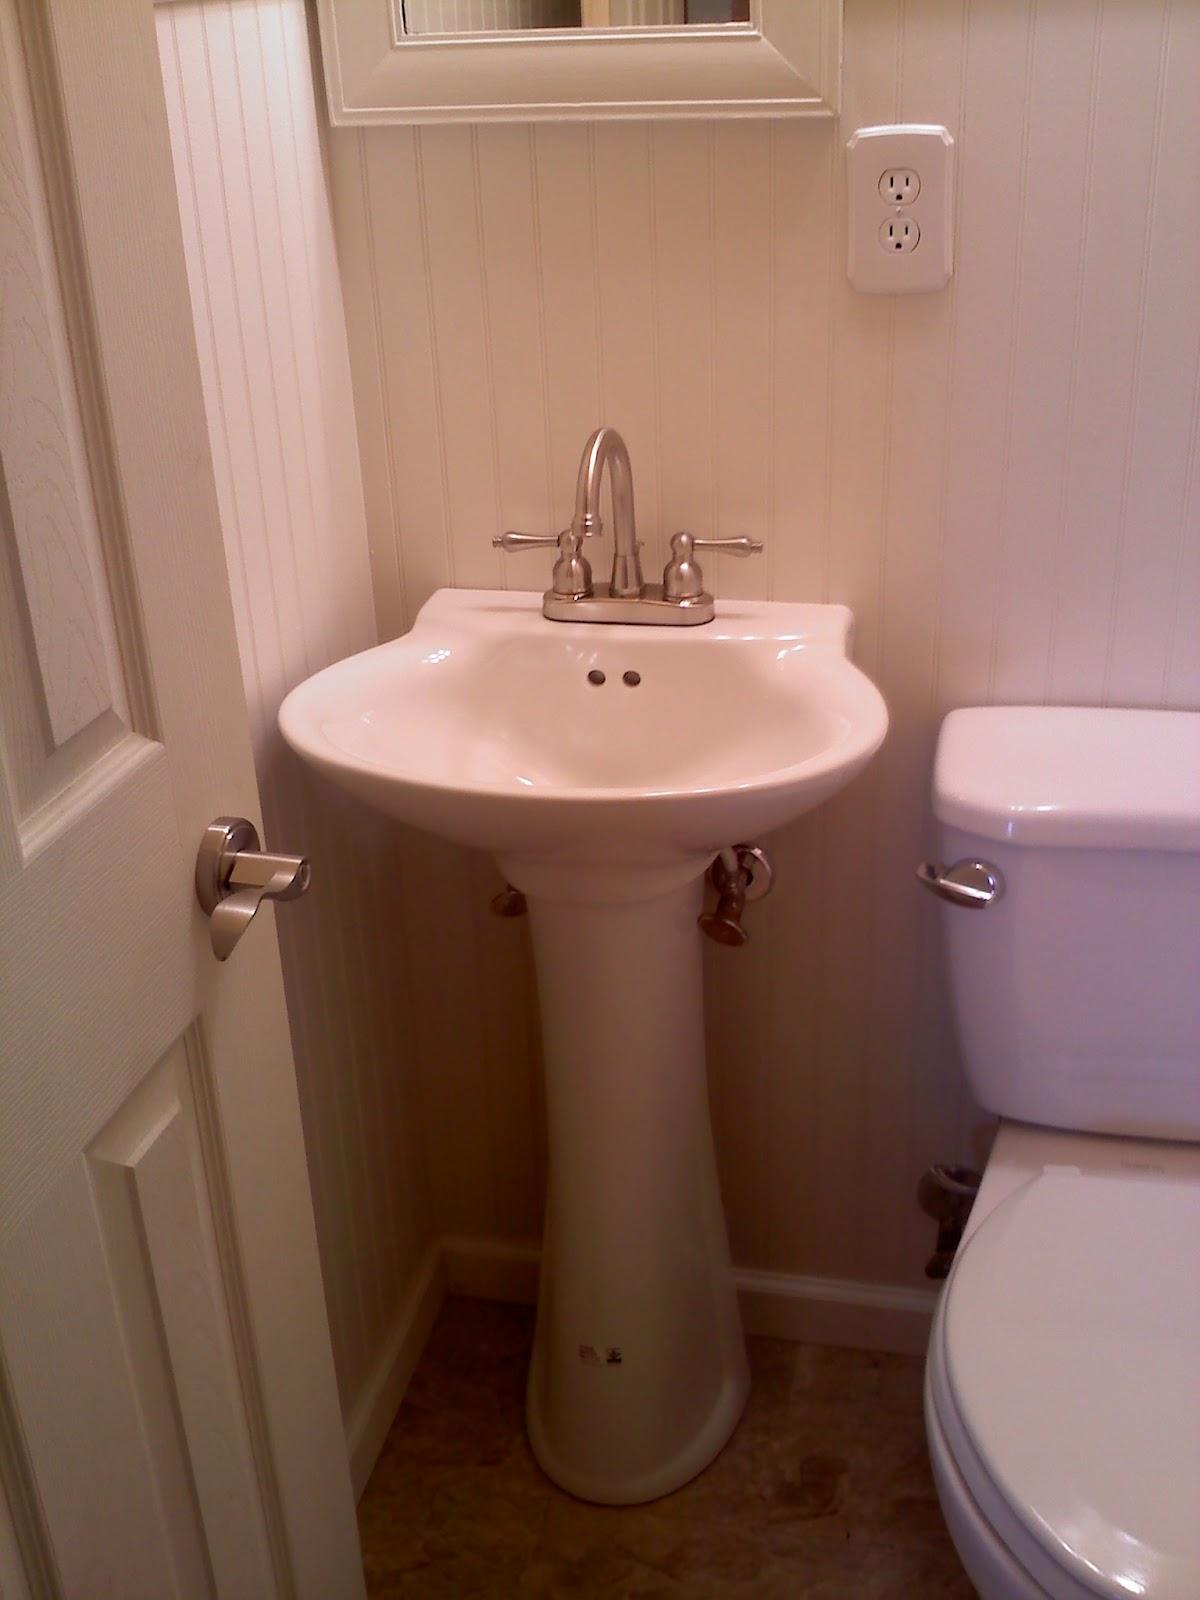 Bathroom Remodel Under 1000 bathroom remodels under 1000 2011 remodel bathroom under 1 000 sq